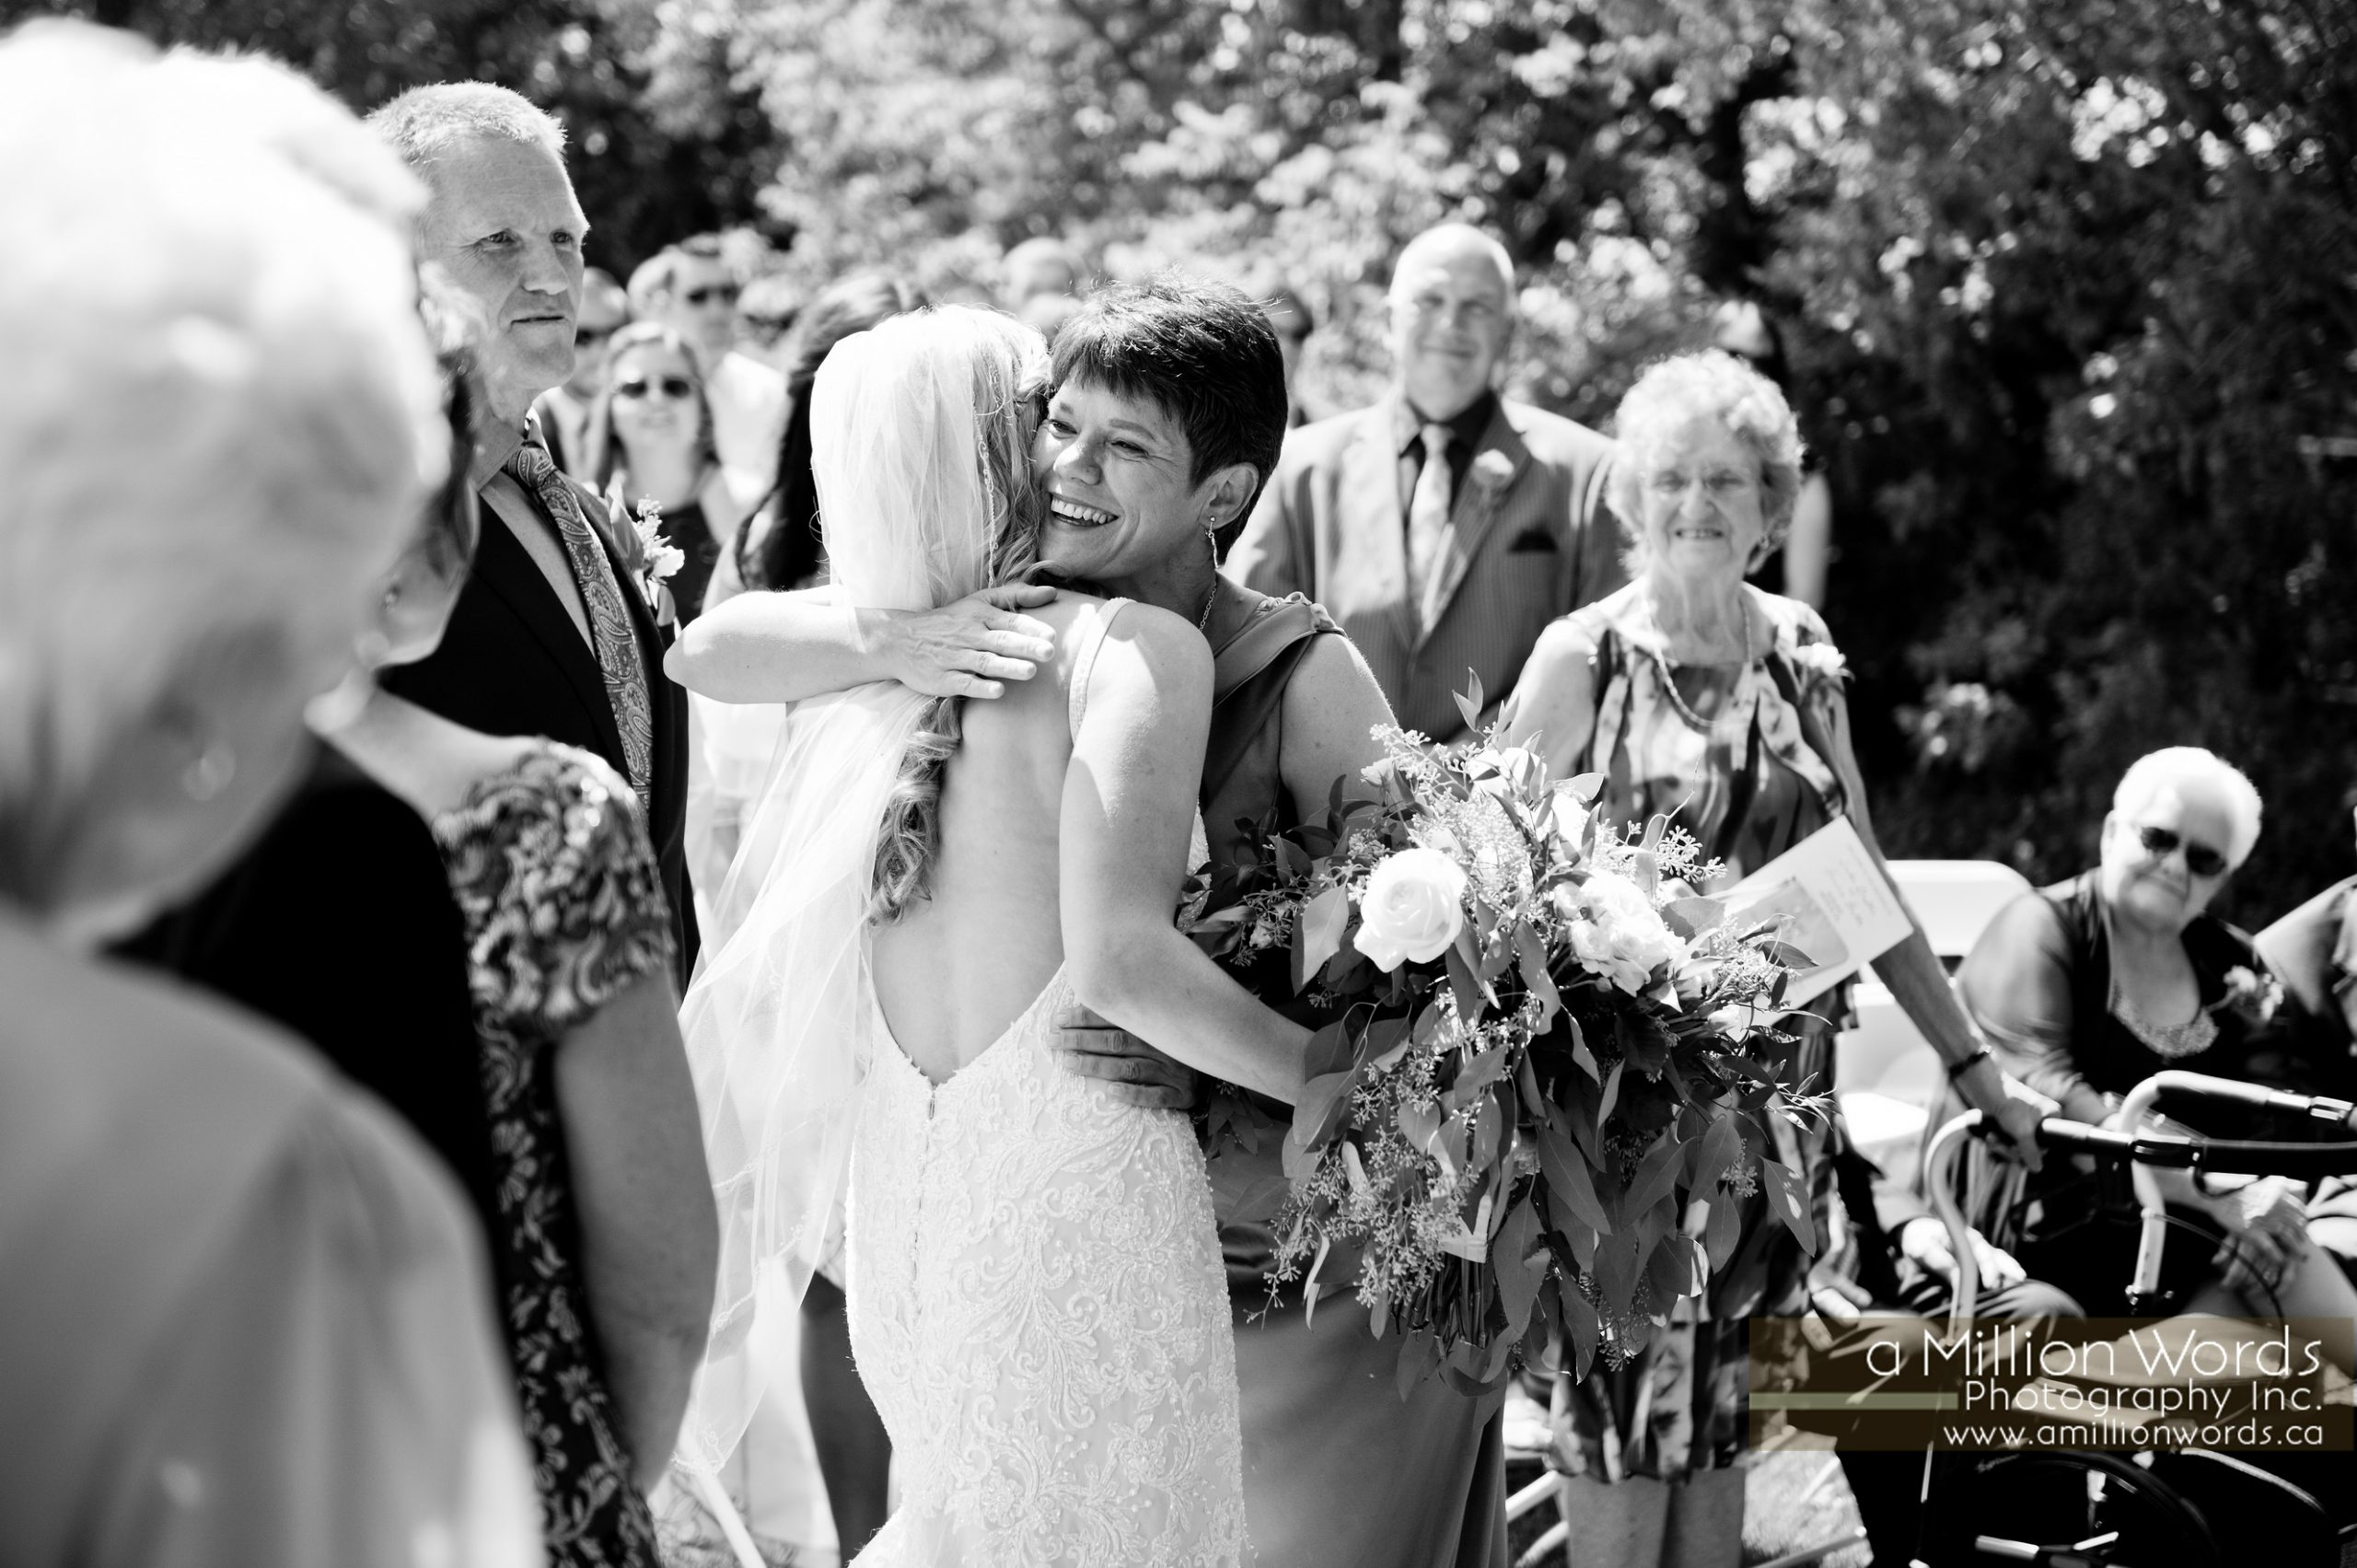 arthur_wedding_photographer29